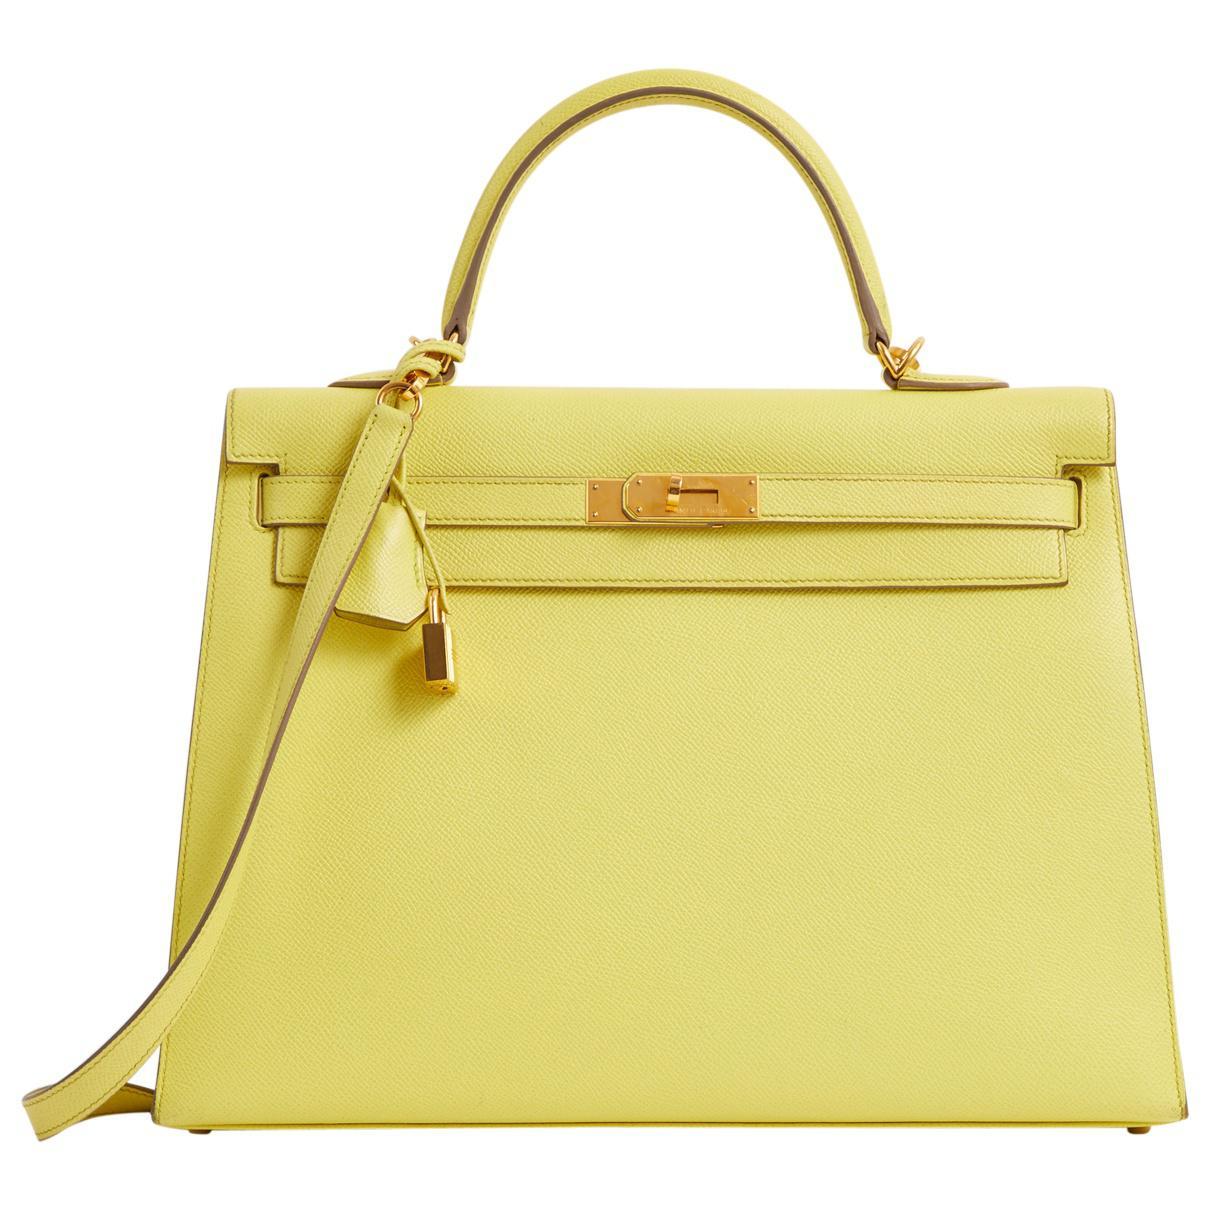 Hermès Pre-owned - Kelly 35 cloth bag dL4gXnDkDP